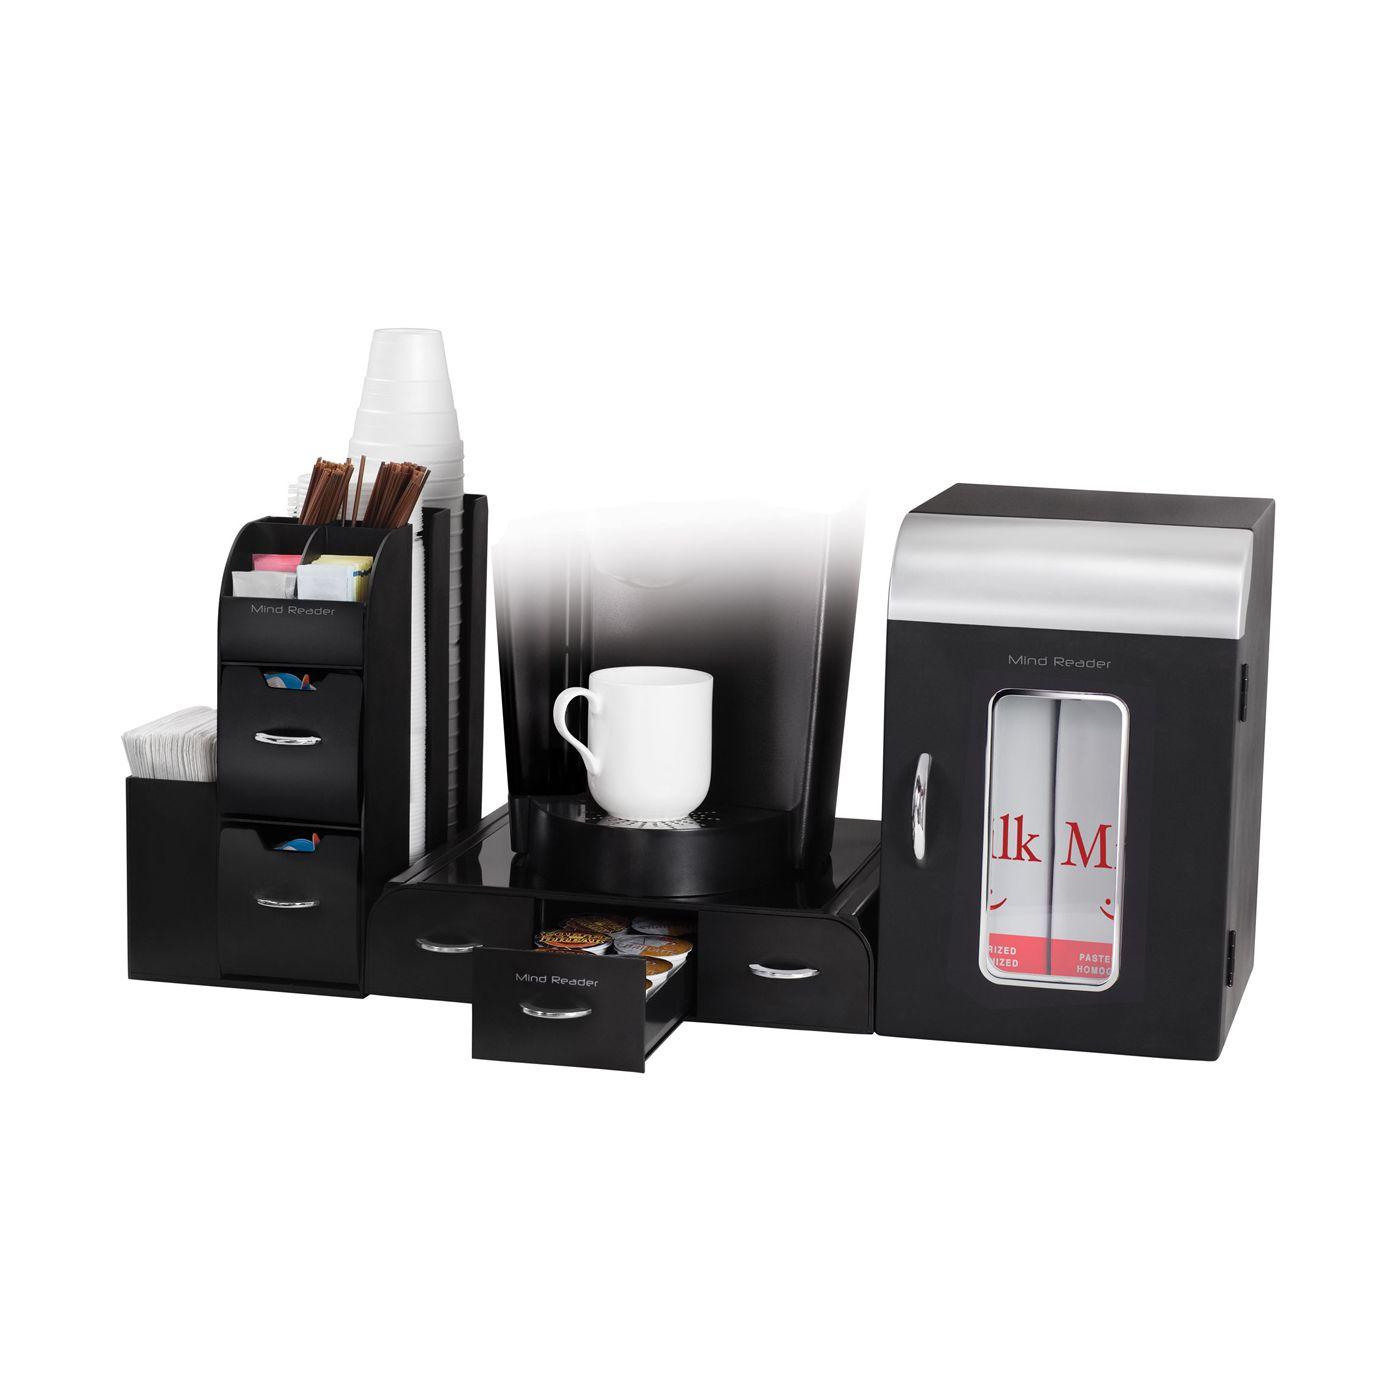 Coffee station organizer home kitchen dining